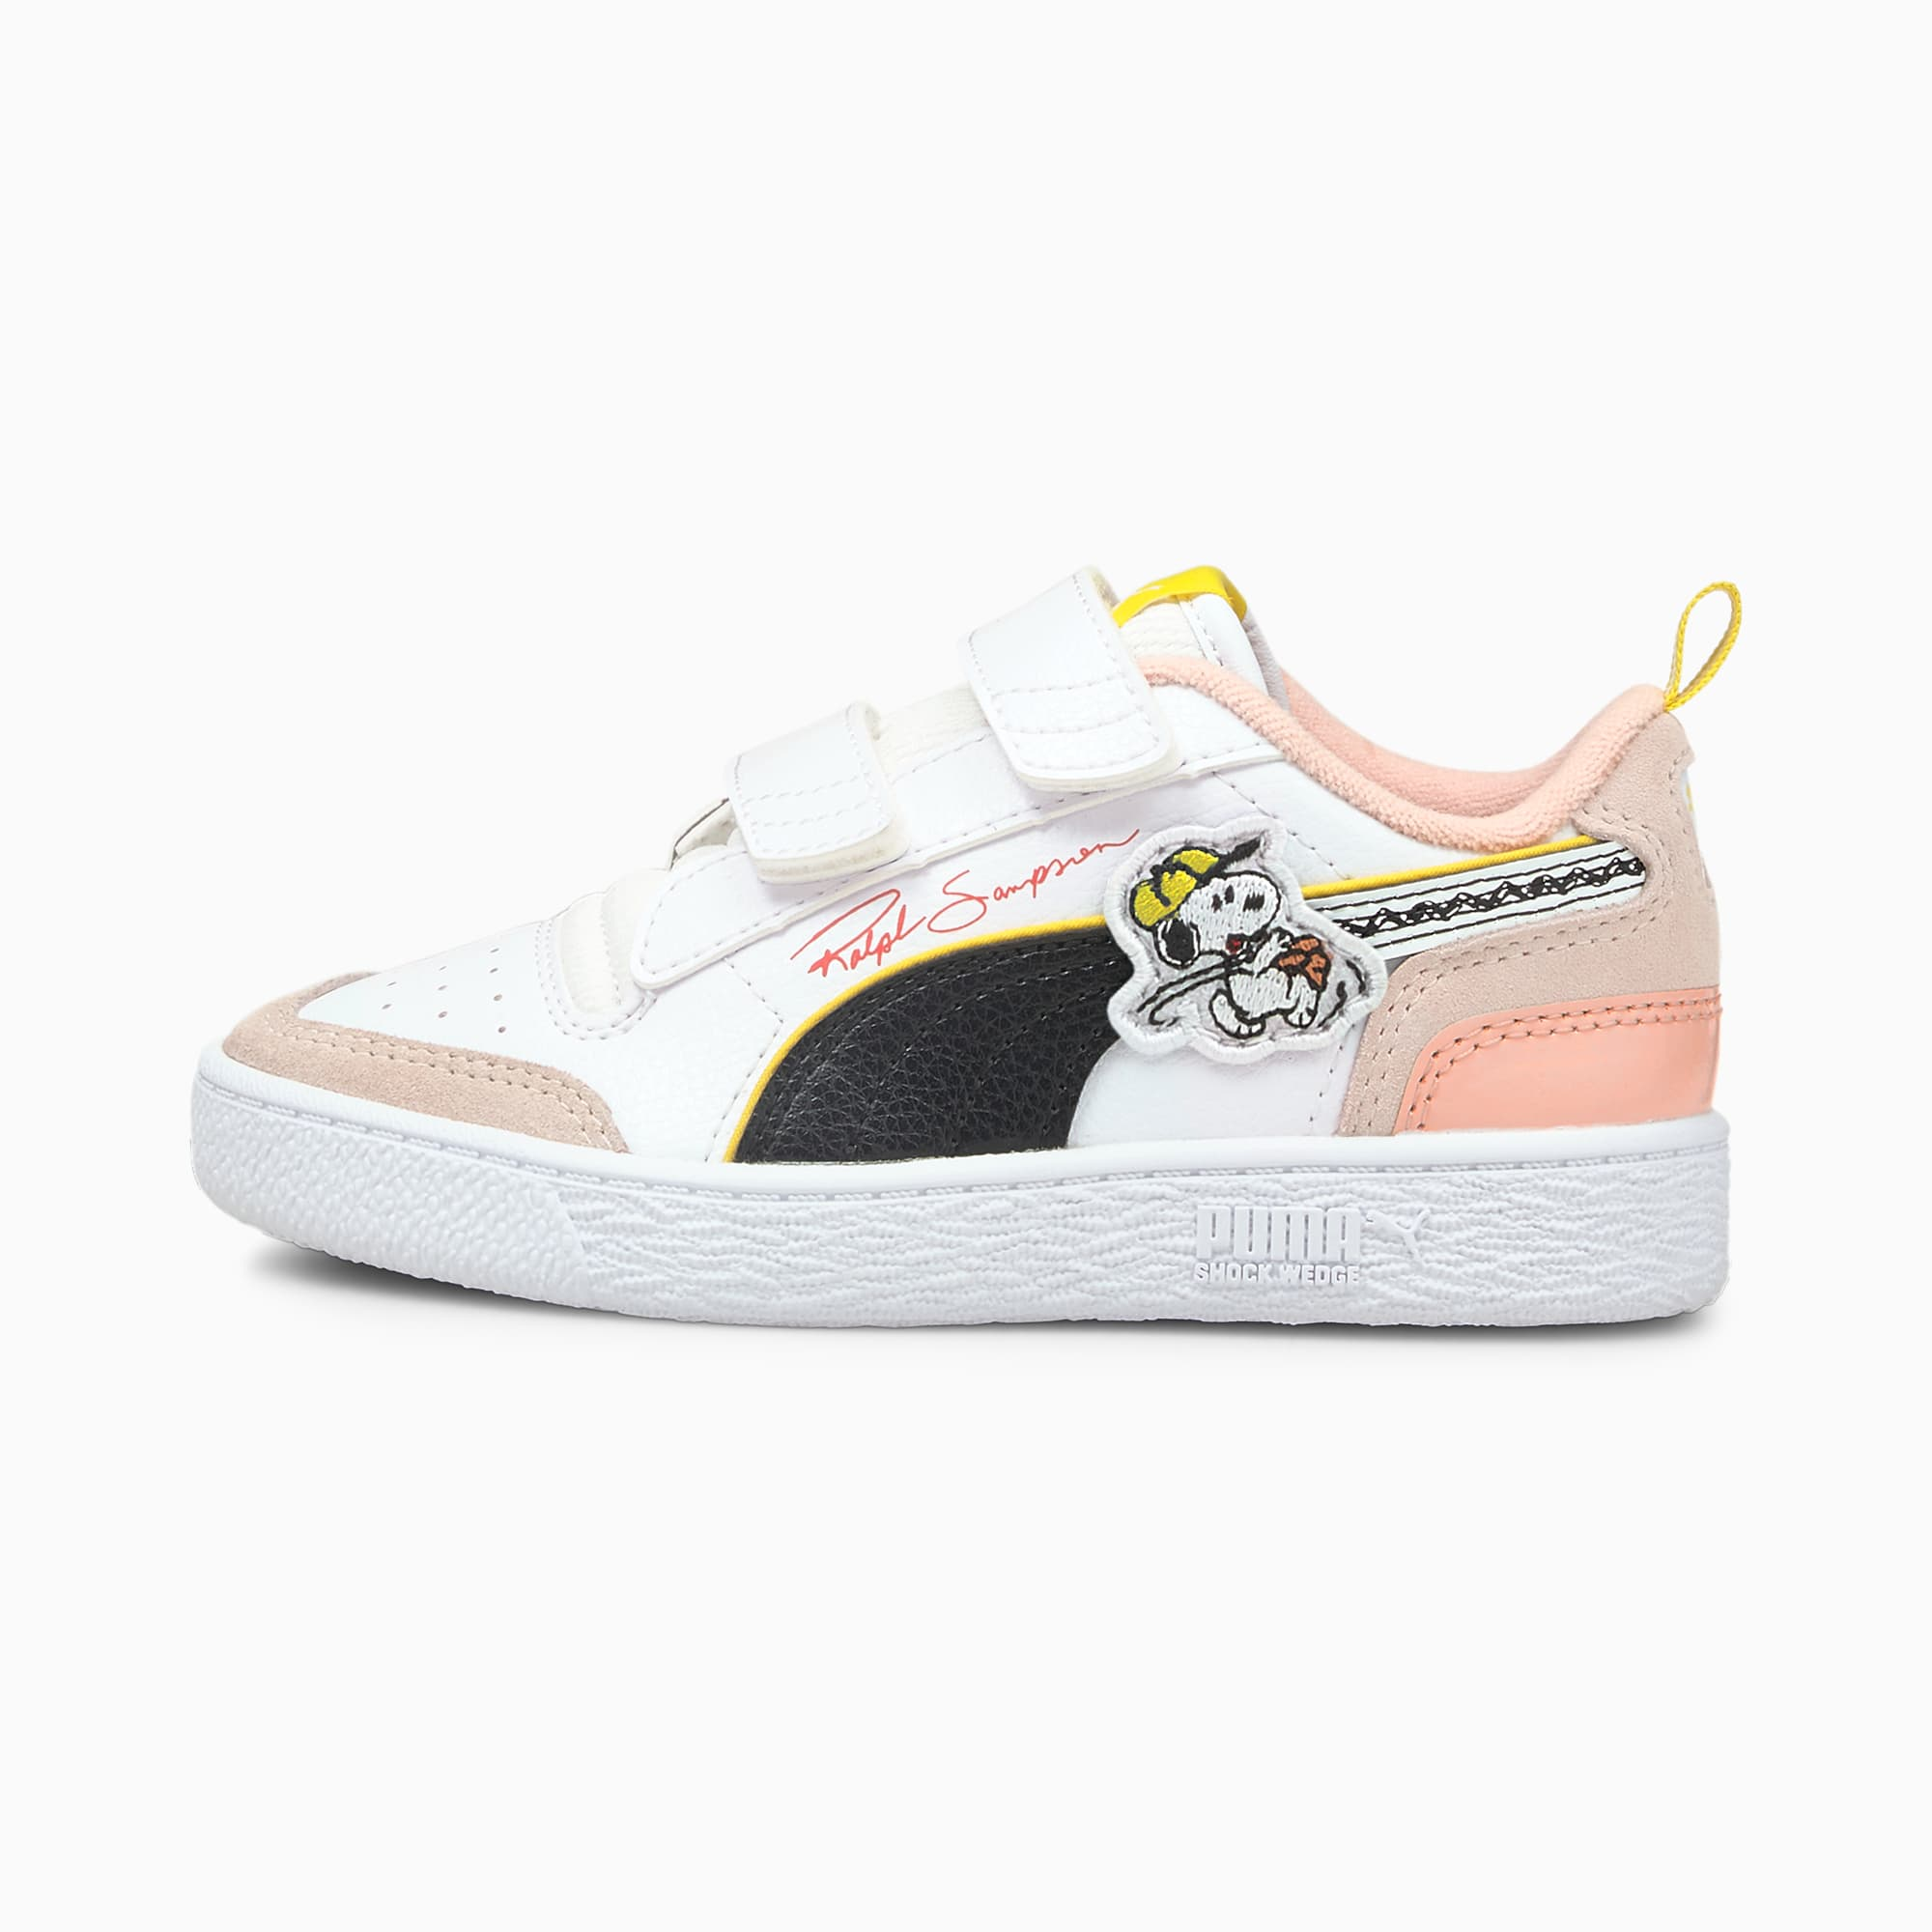 PUMA x PEANUTS Ralph Sampson Little Kids' Shoes